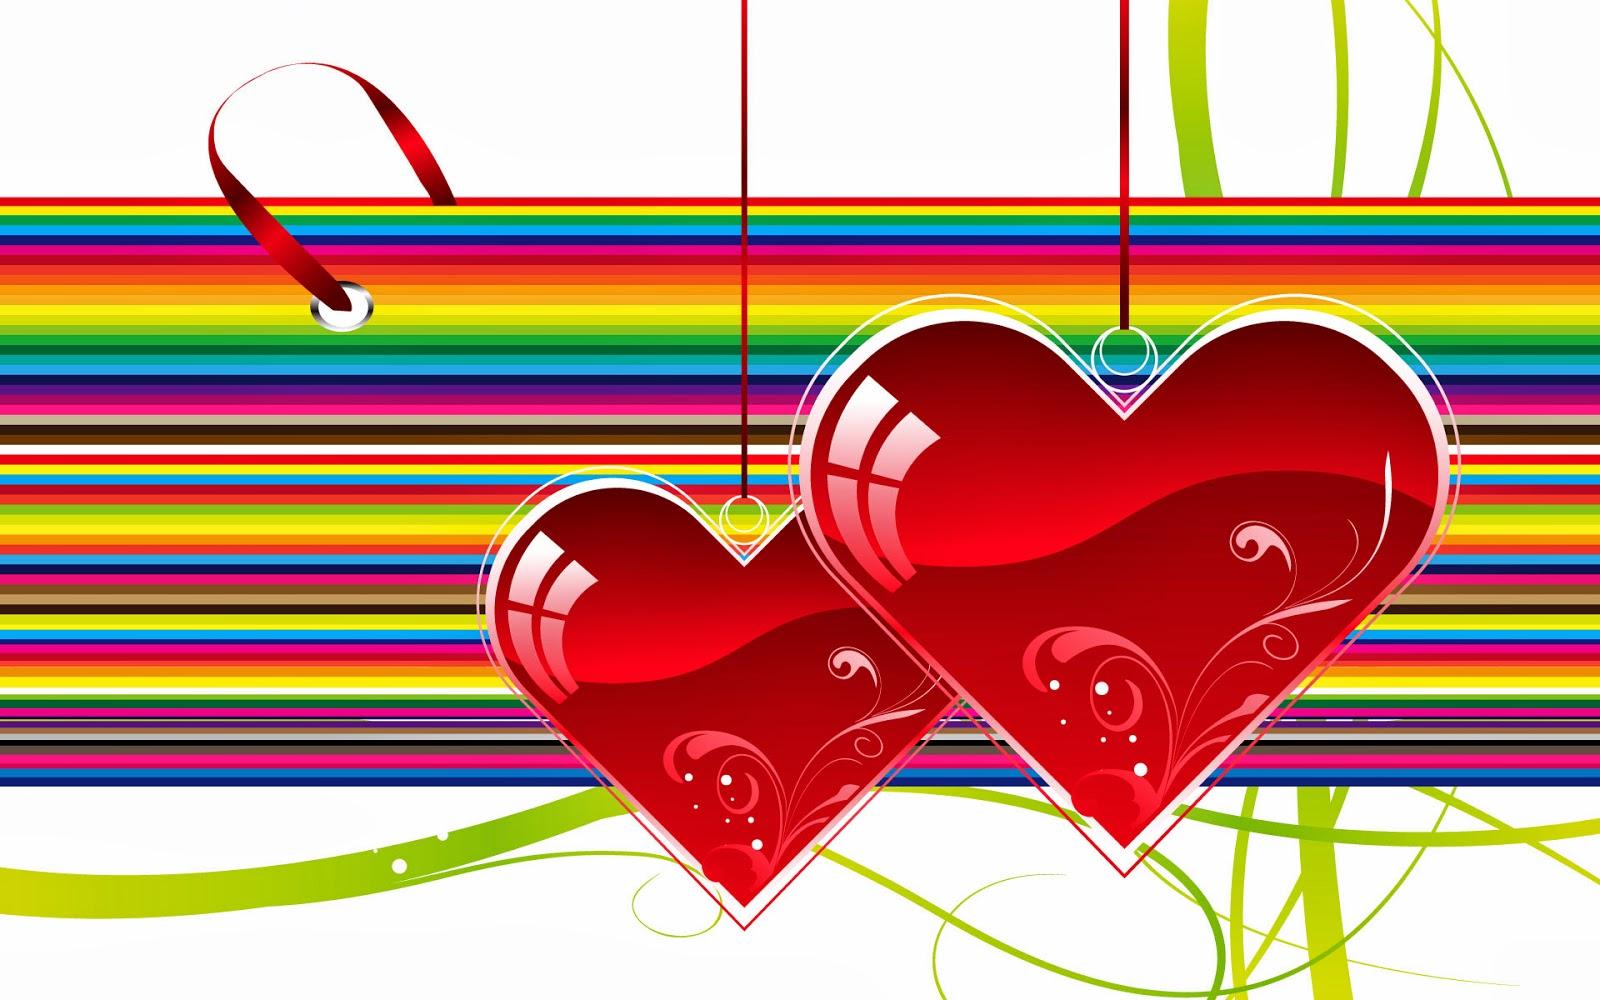 Fondos De Pantalla San Valentin Gratis: HD Wallpapers Gratis: Fondo De Pantalla Dia De San